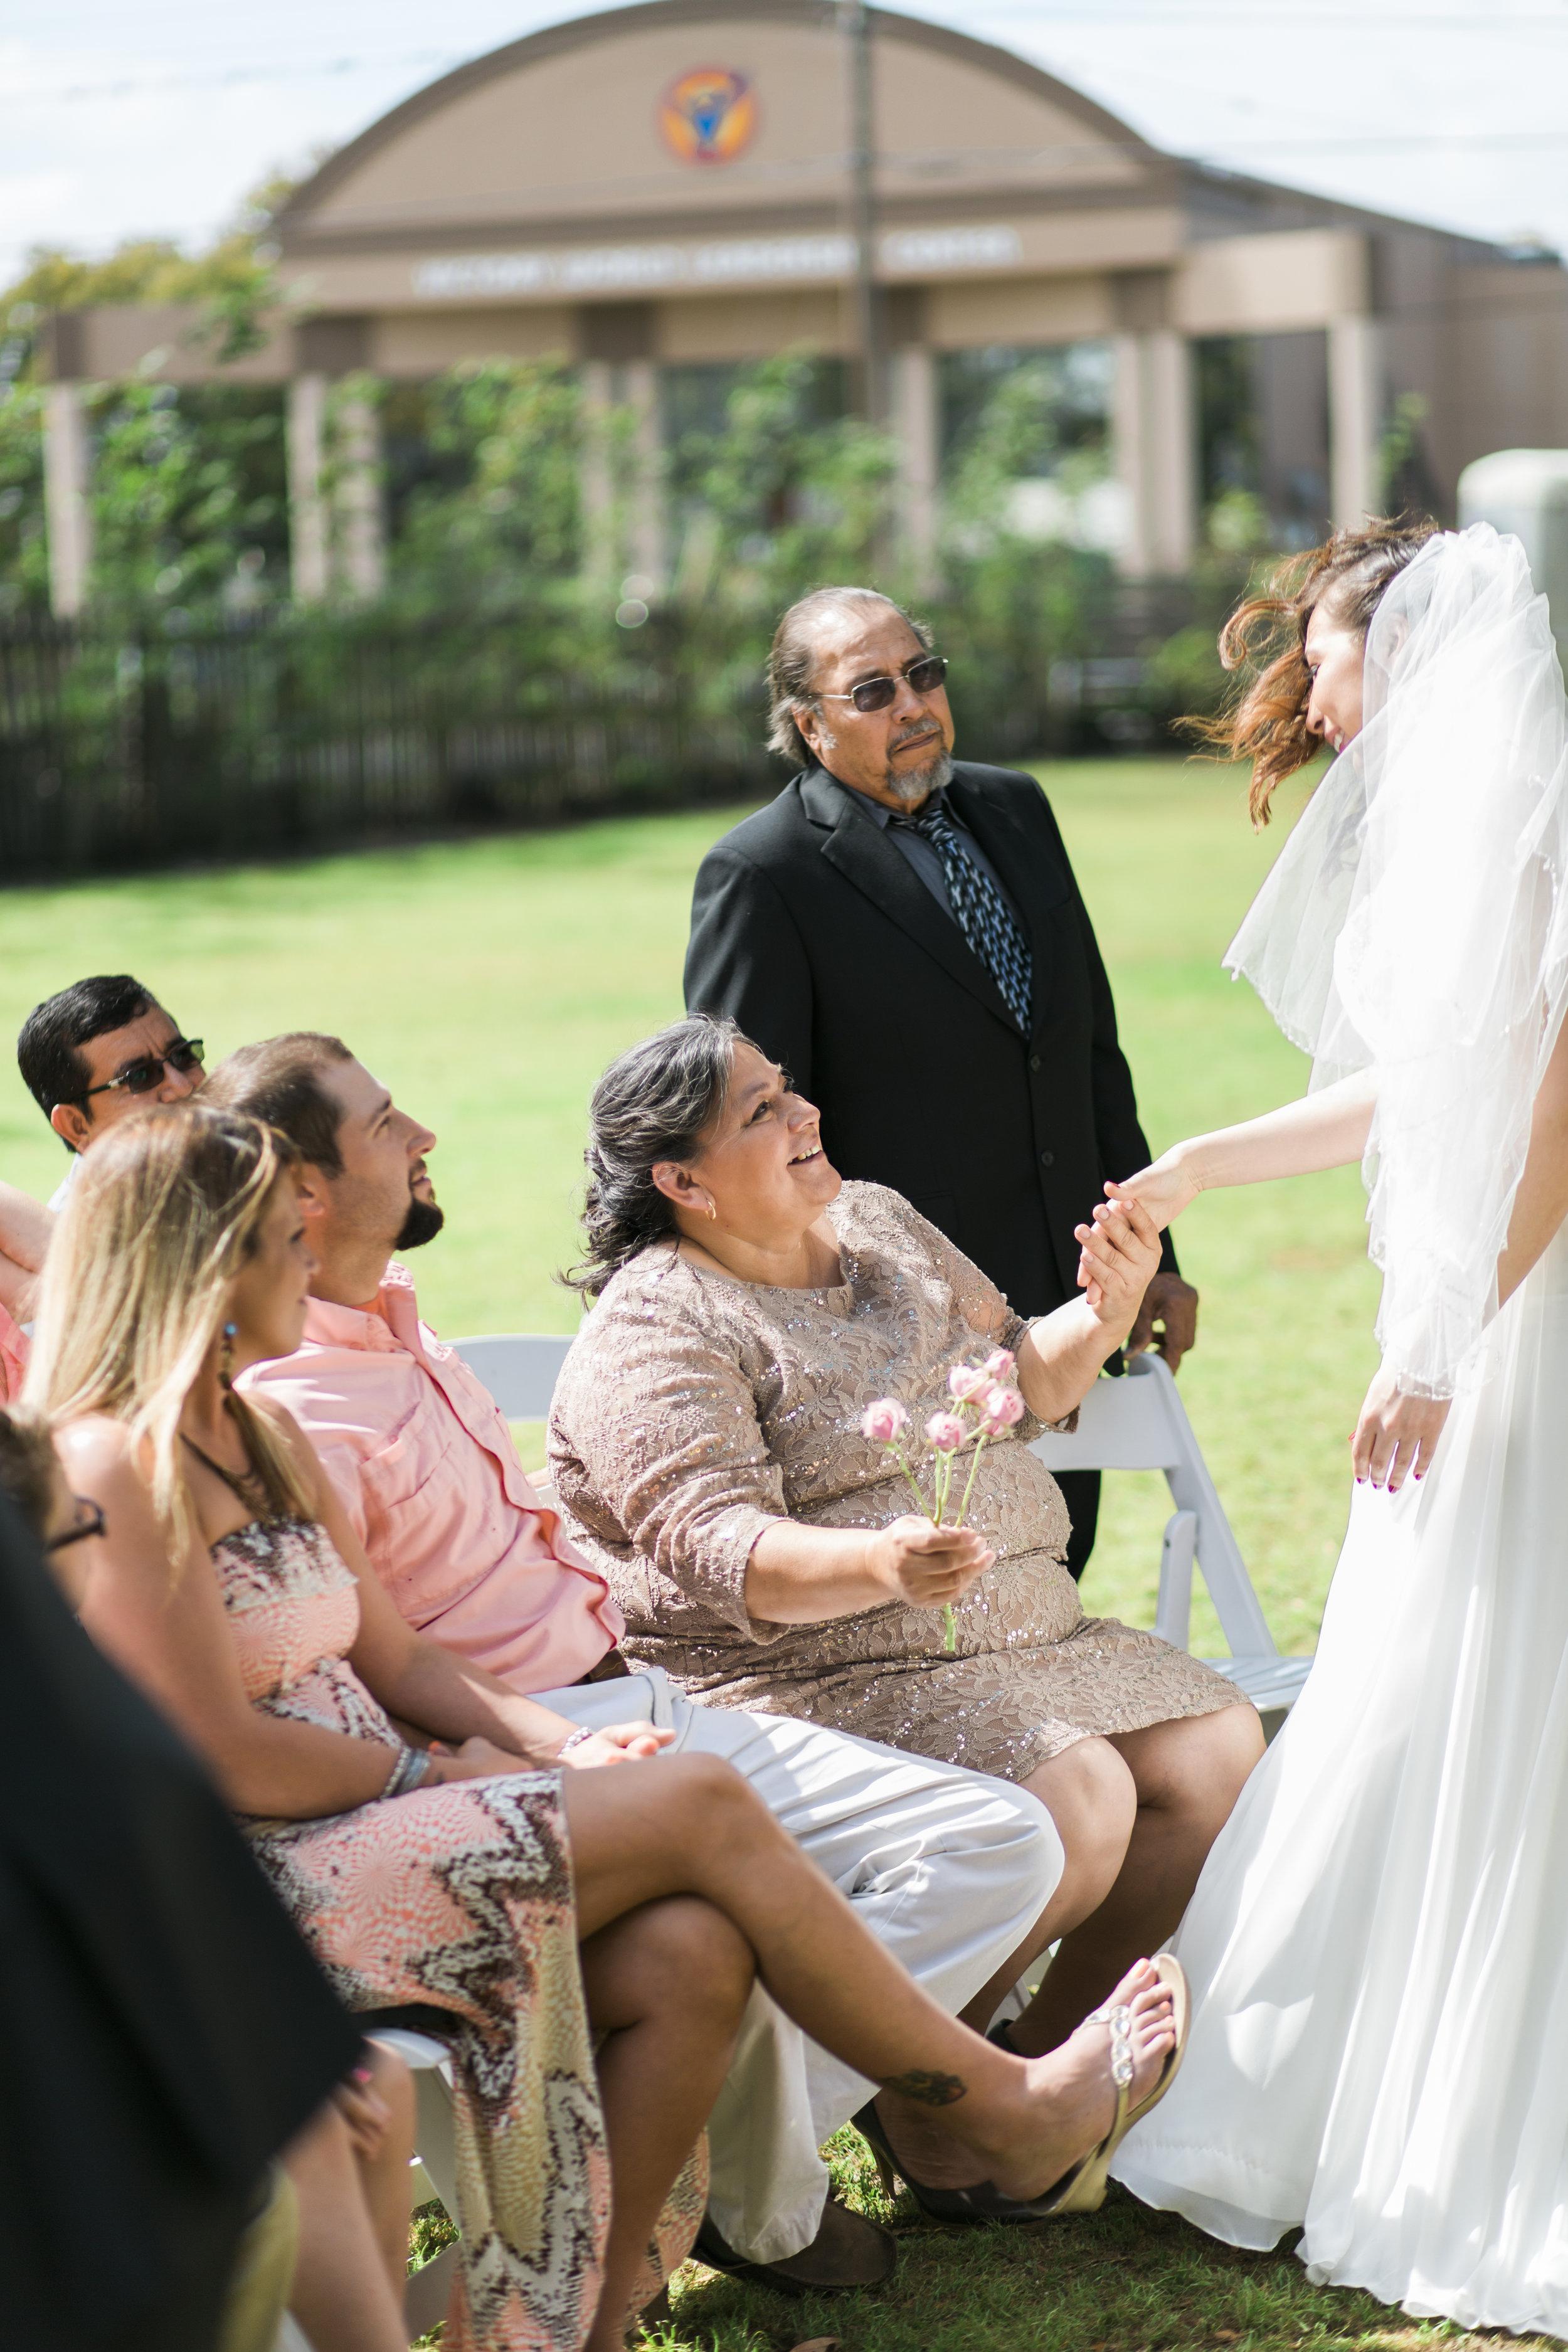 Veronica + Mark - The Acre Orlando - Sarasota Wedding Photography - Ceremony Photos - Emily & Co. Photography (60).jpg